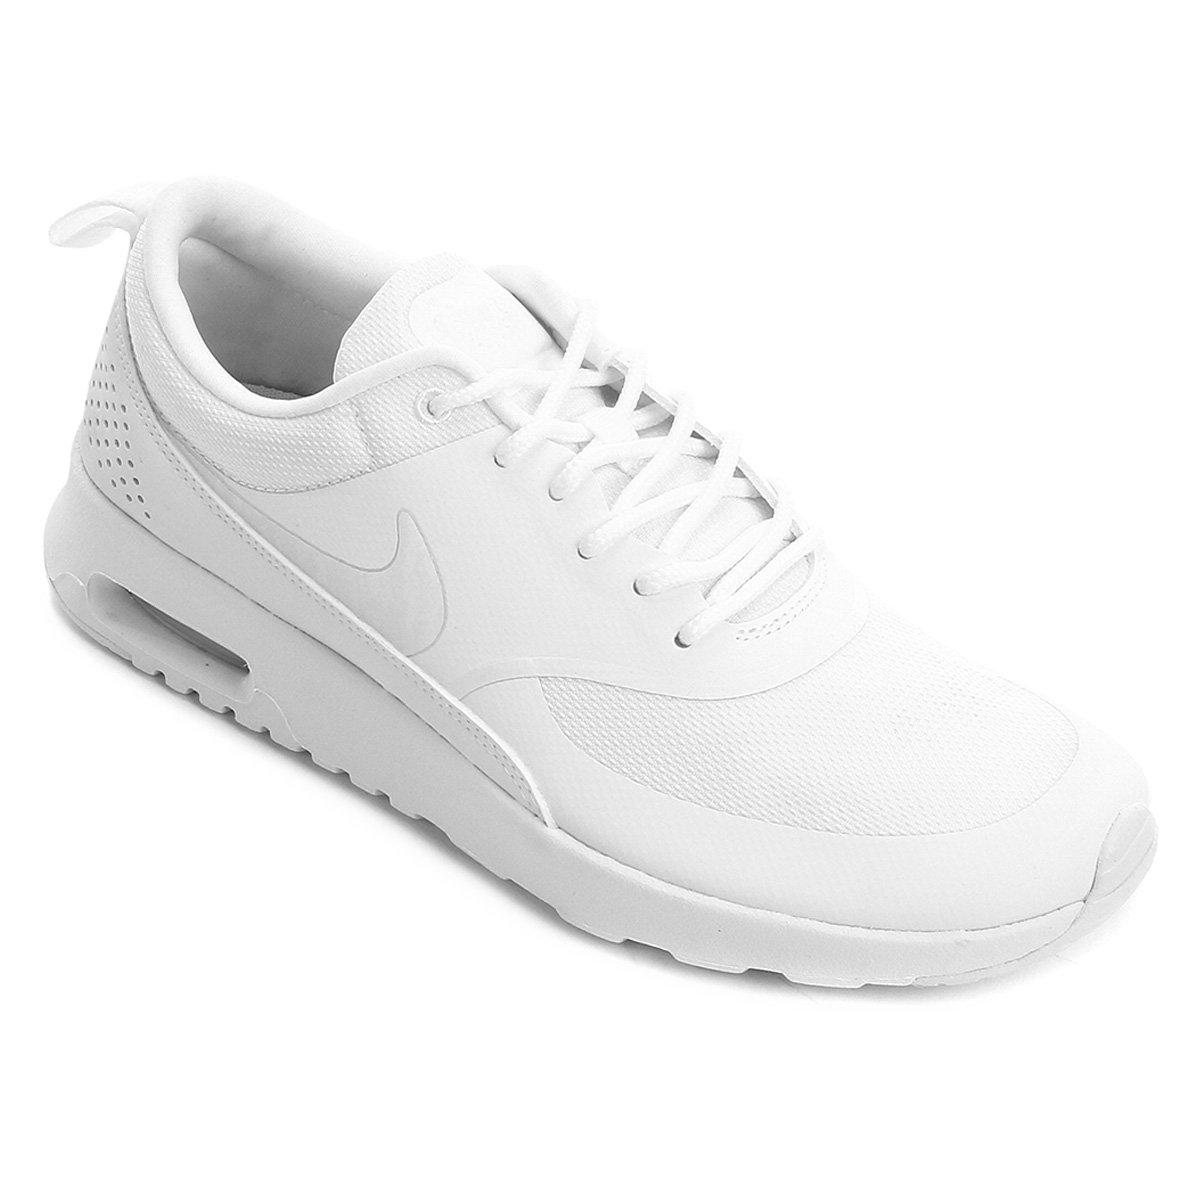 nike air max thea netshoes